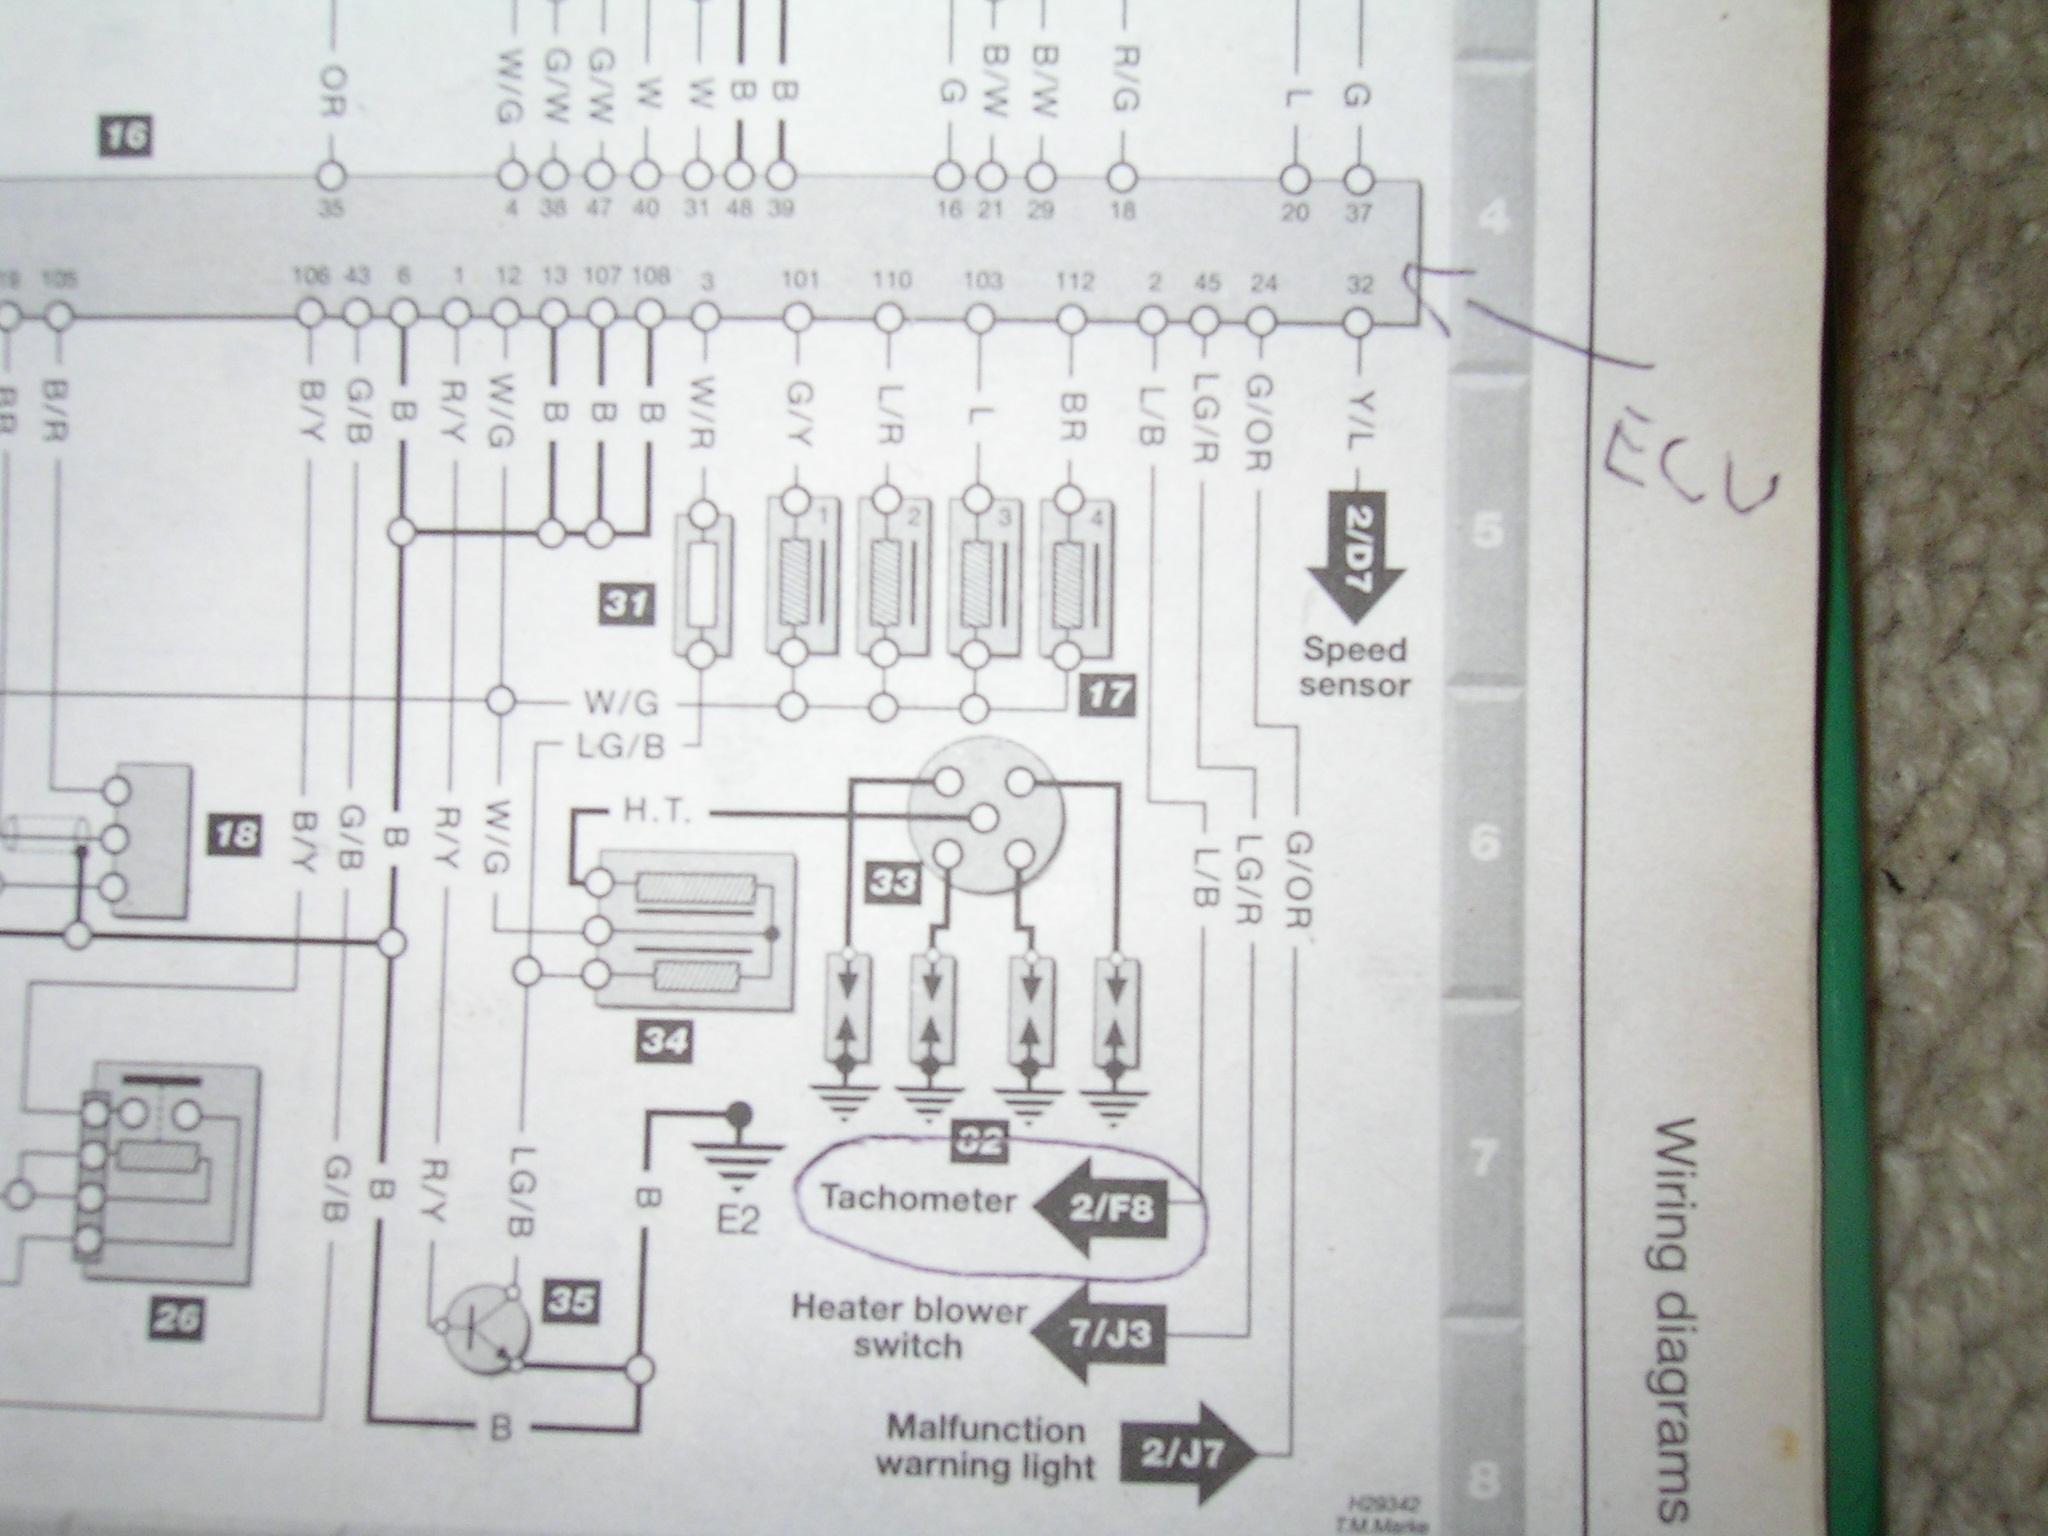 Nissan K11 Wiring Diagram - Wiring Diagrams on